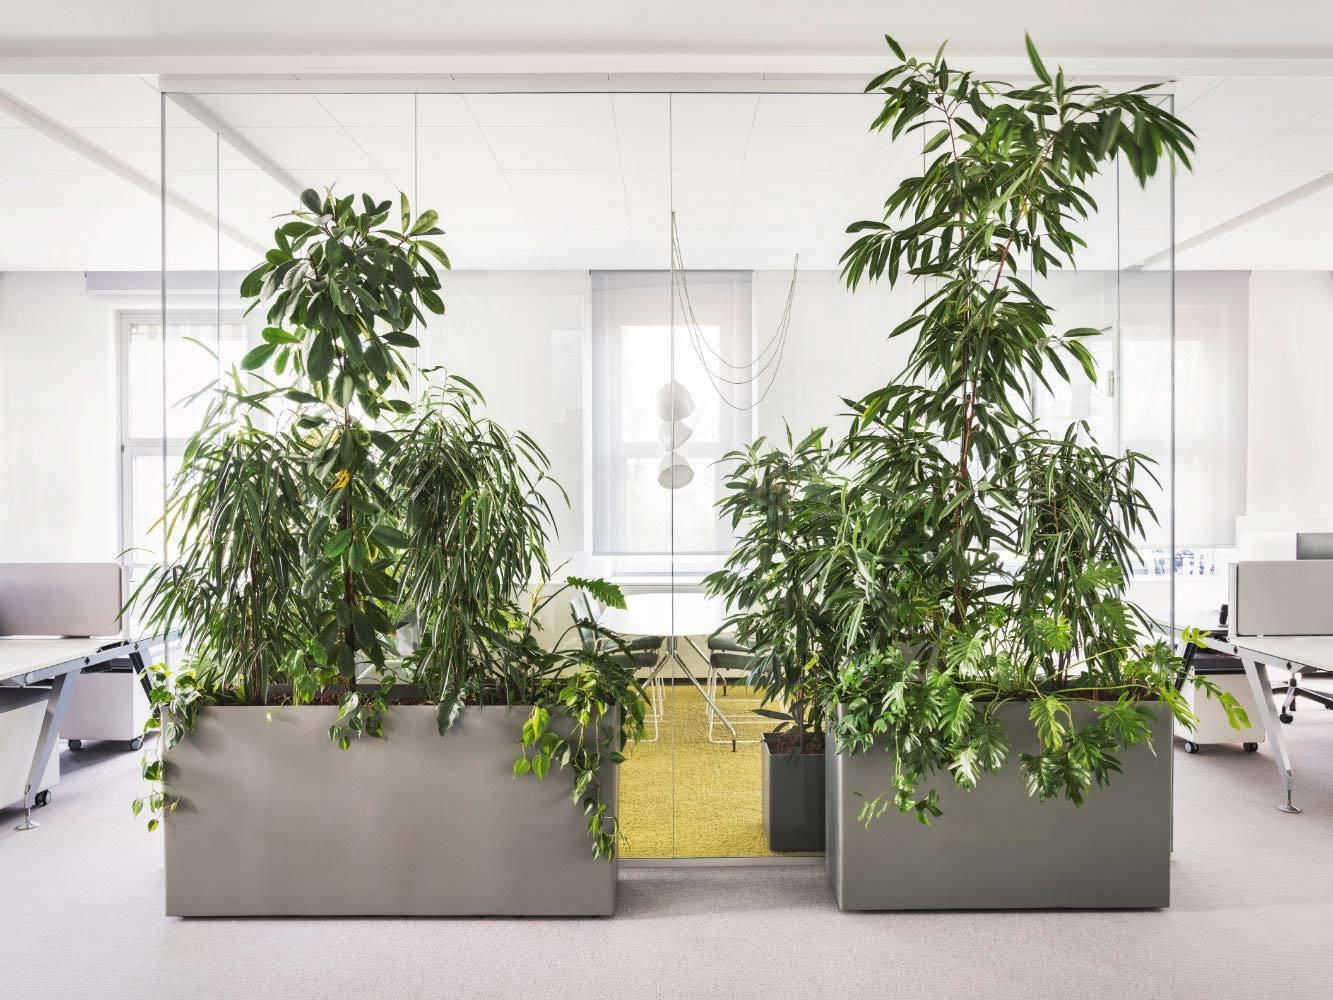 Studio Plants, Phoenix GmbH, 2019, Pflanzen: Objektbepflanzung J.Reiffer, Foto: Sarah Weiselowski